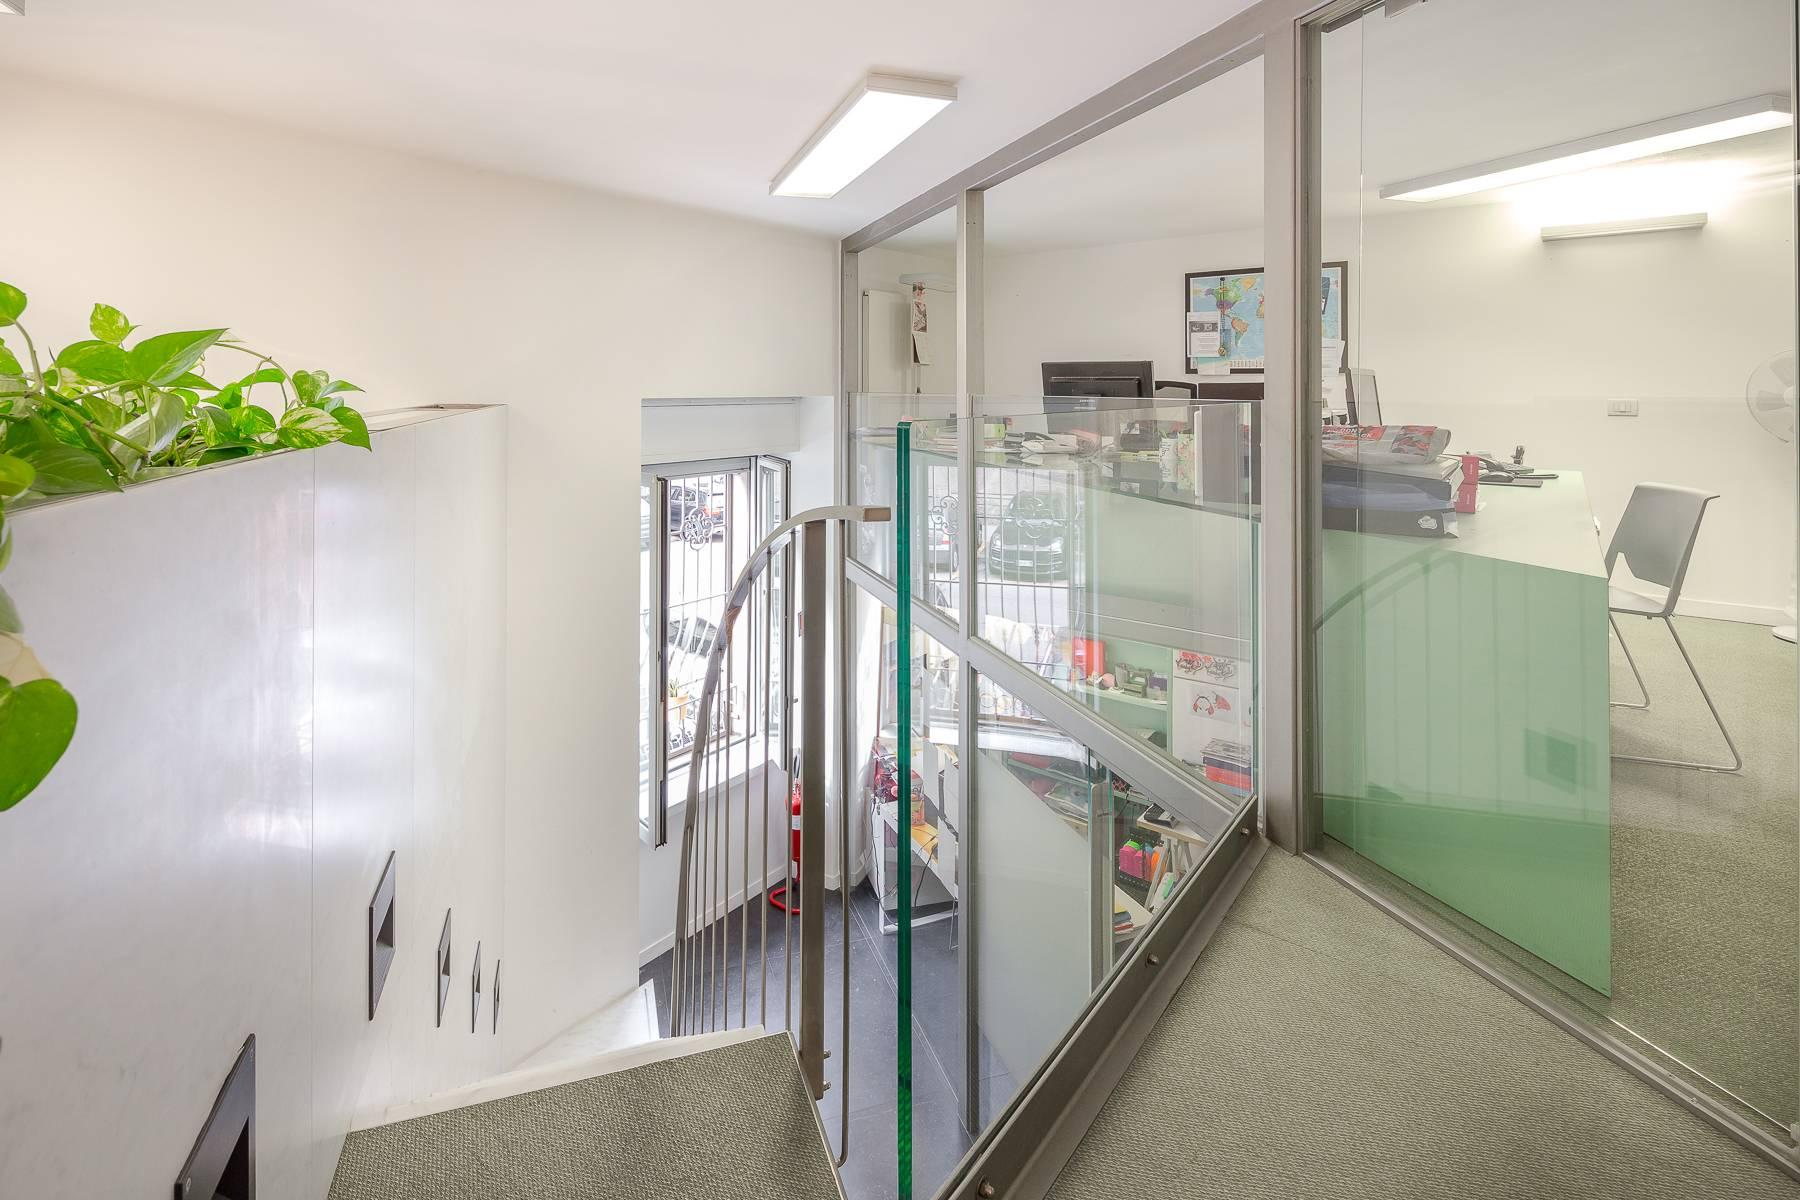 Opne-Space Büro / Wohnimmobilie auf der Piazza Giovine Italia / Via Aurelio Saffi - 4